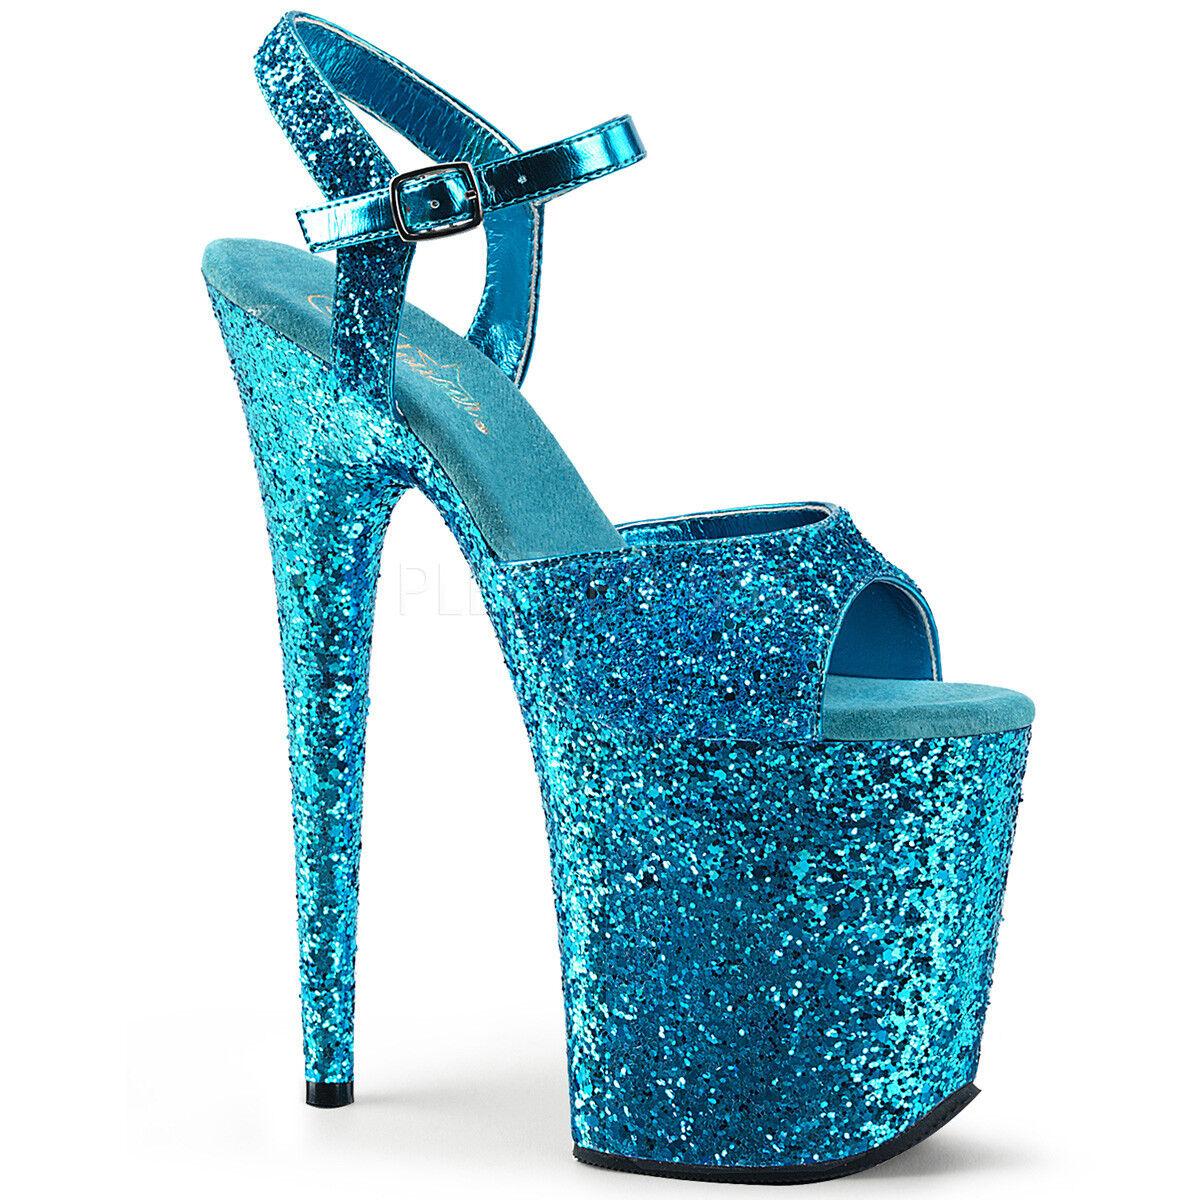 Pleaser FLAMINGO-810LG Exotic Dancing shoes 8  Heel Heel Heel Ankle Strap Platform Sandal. ae3763